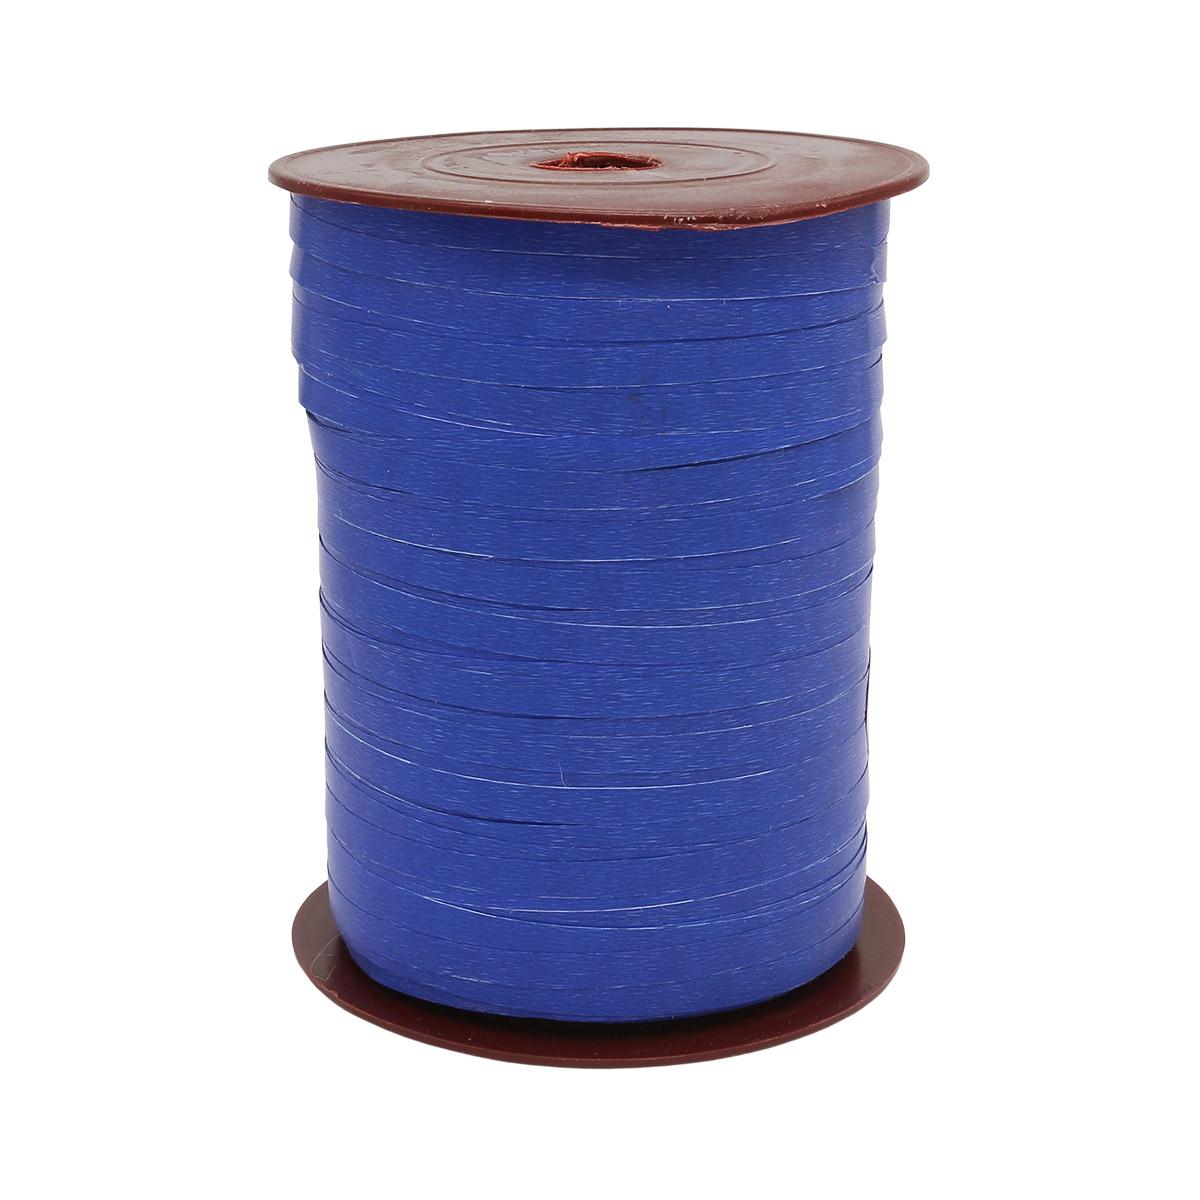 1050342 Лента простая 0,5/250 President синяя